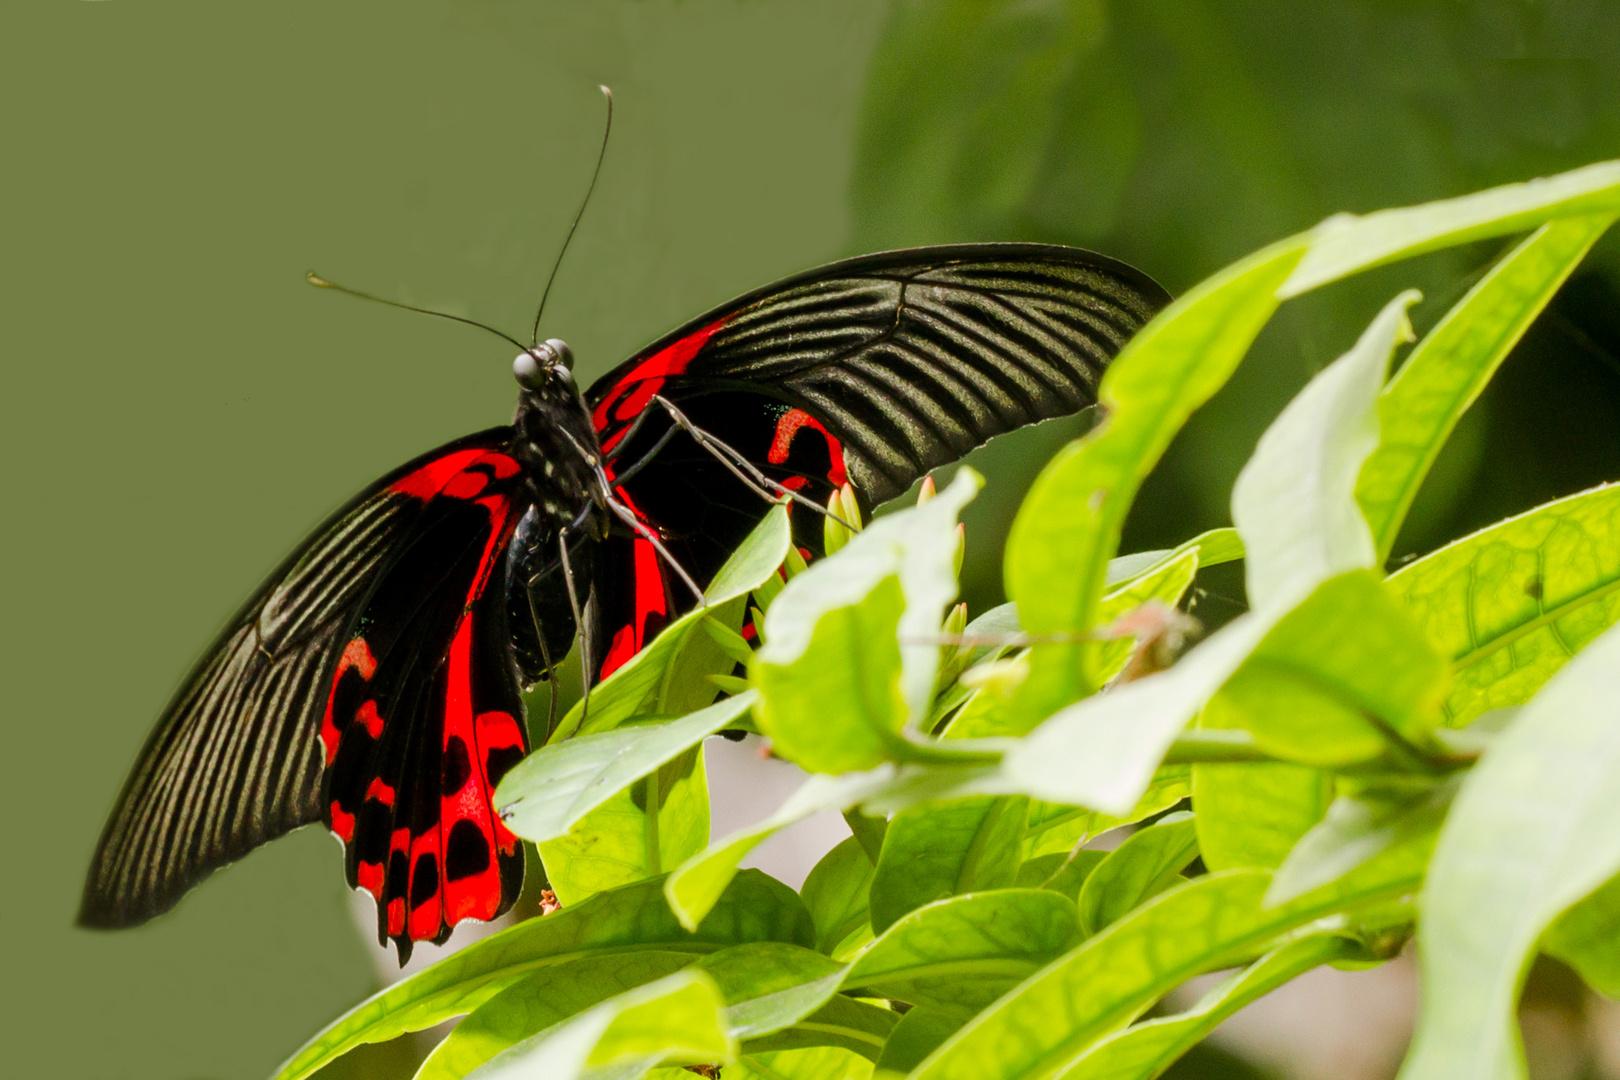 Beobachter im Schmetterlingshaus